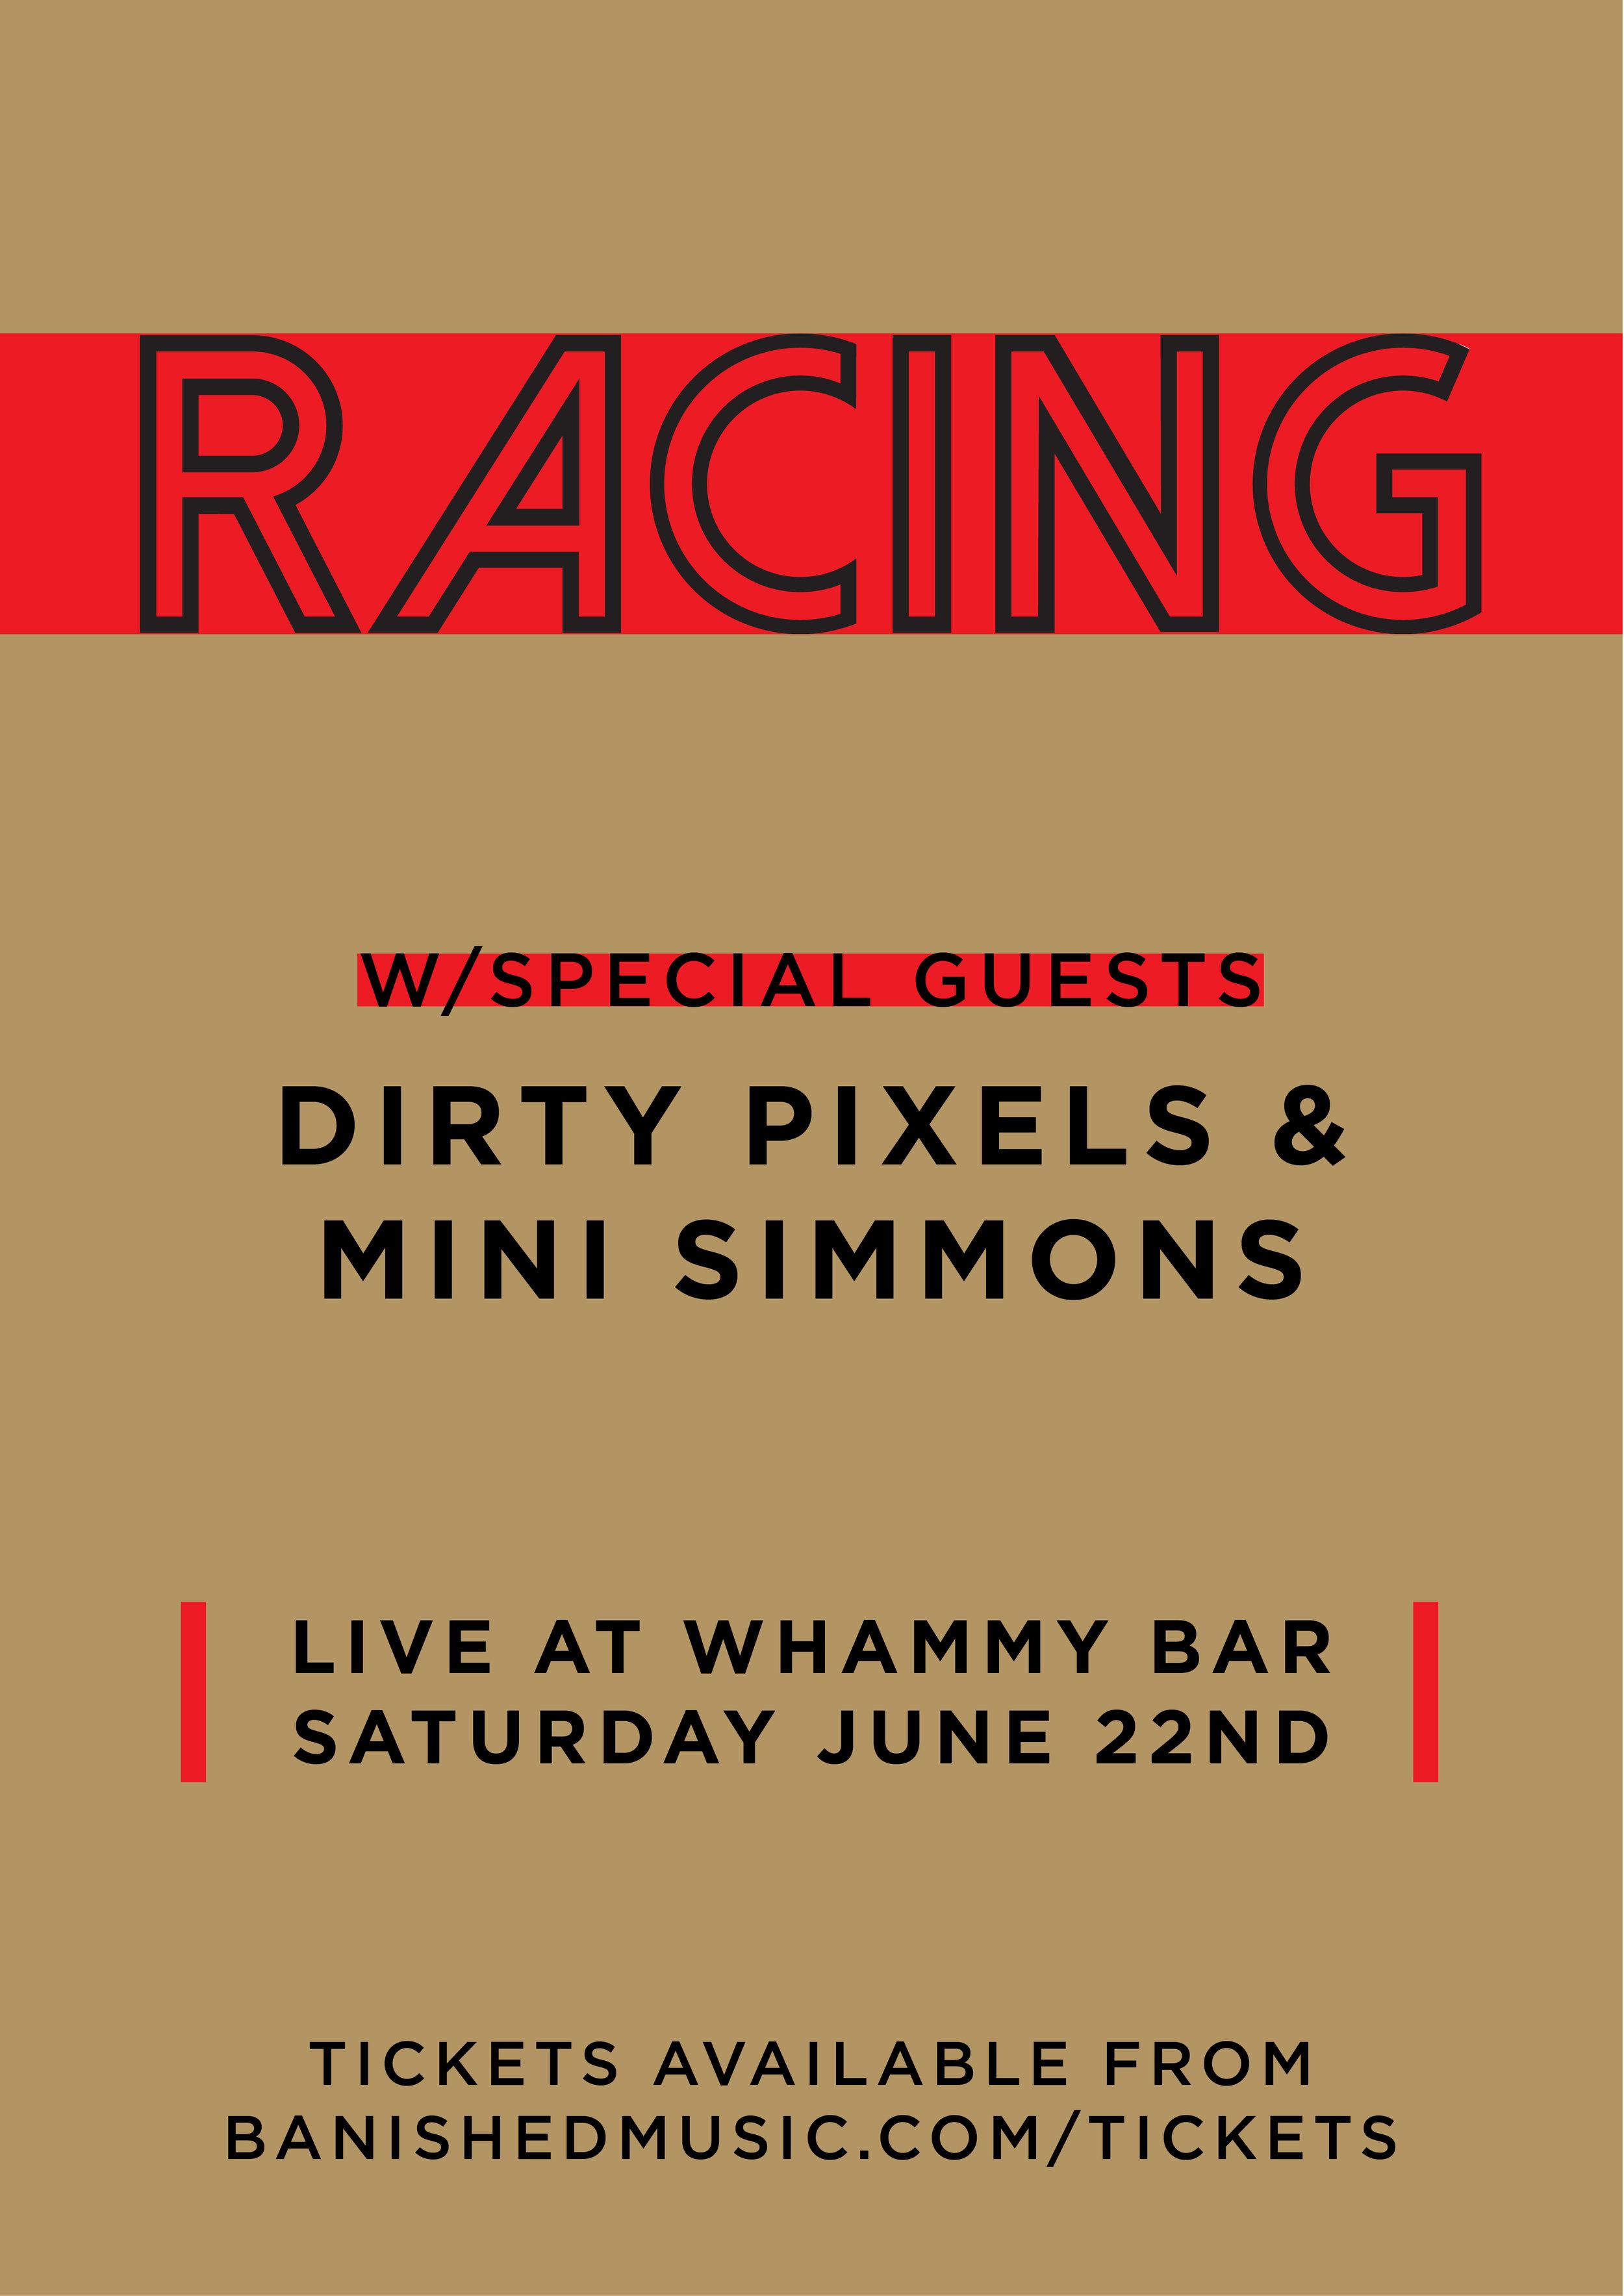 Racing Poster May 2019 AW.jpg